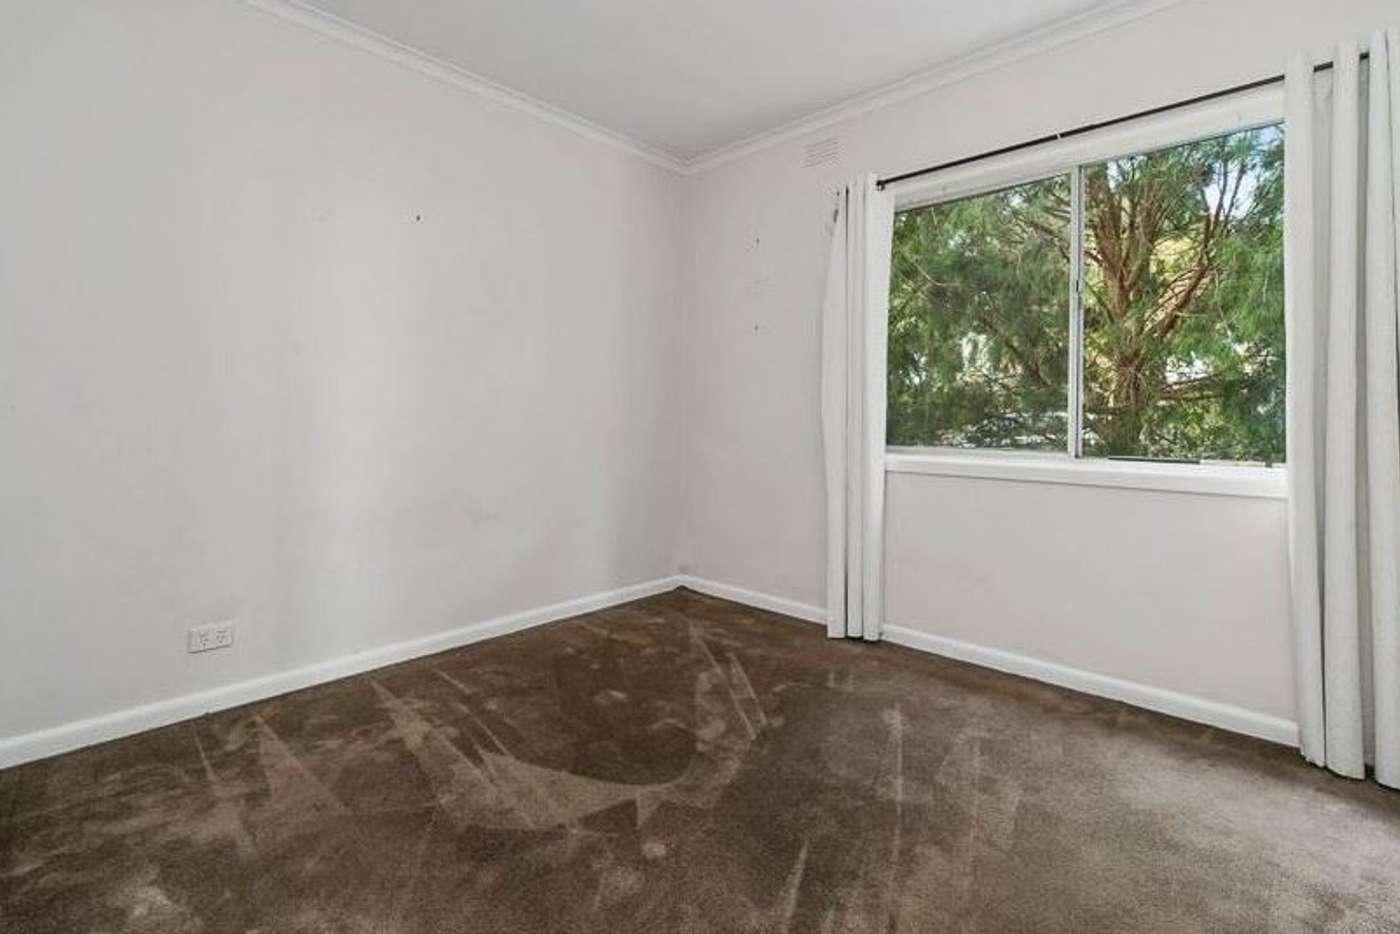 Seventh view of Homely blockOfUnits listing, 30 Gweno Avenue, Frankston VIC 3199